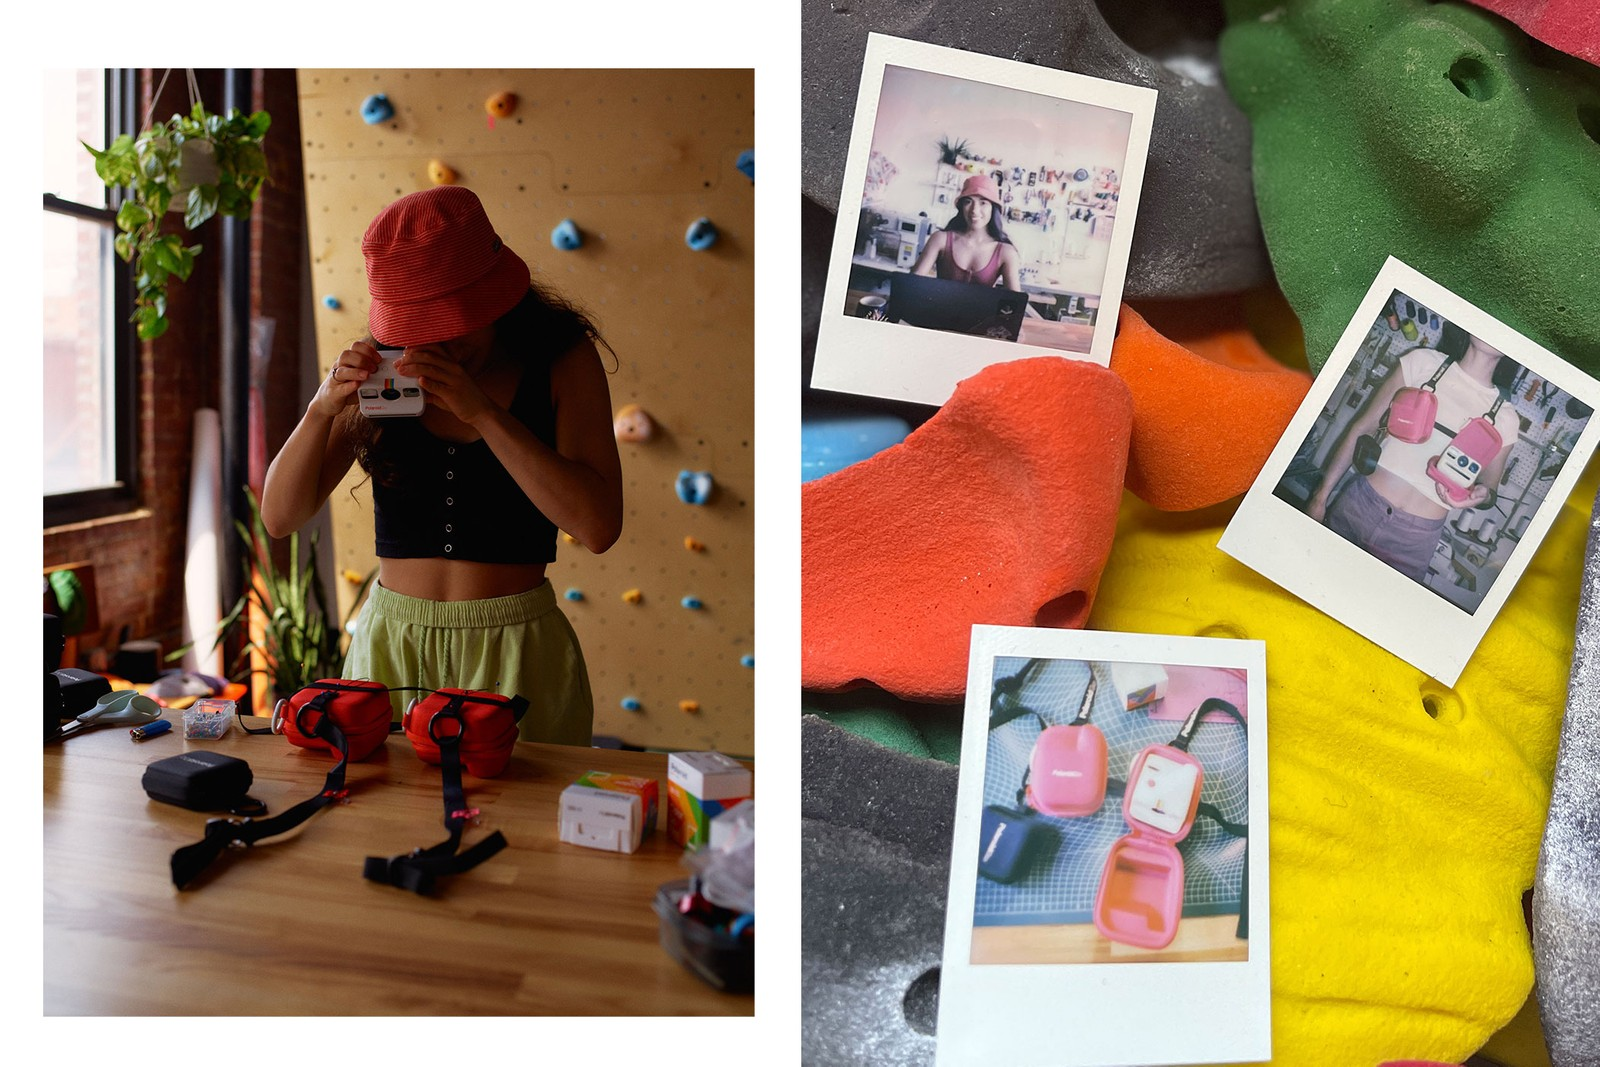 Nicole McLaughlin Polaroid Collaboration Upcycled Camera Case Harness Top Photo Diary